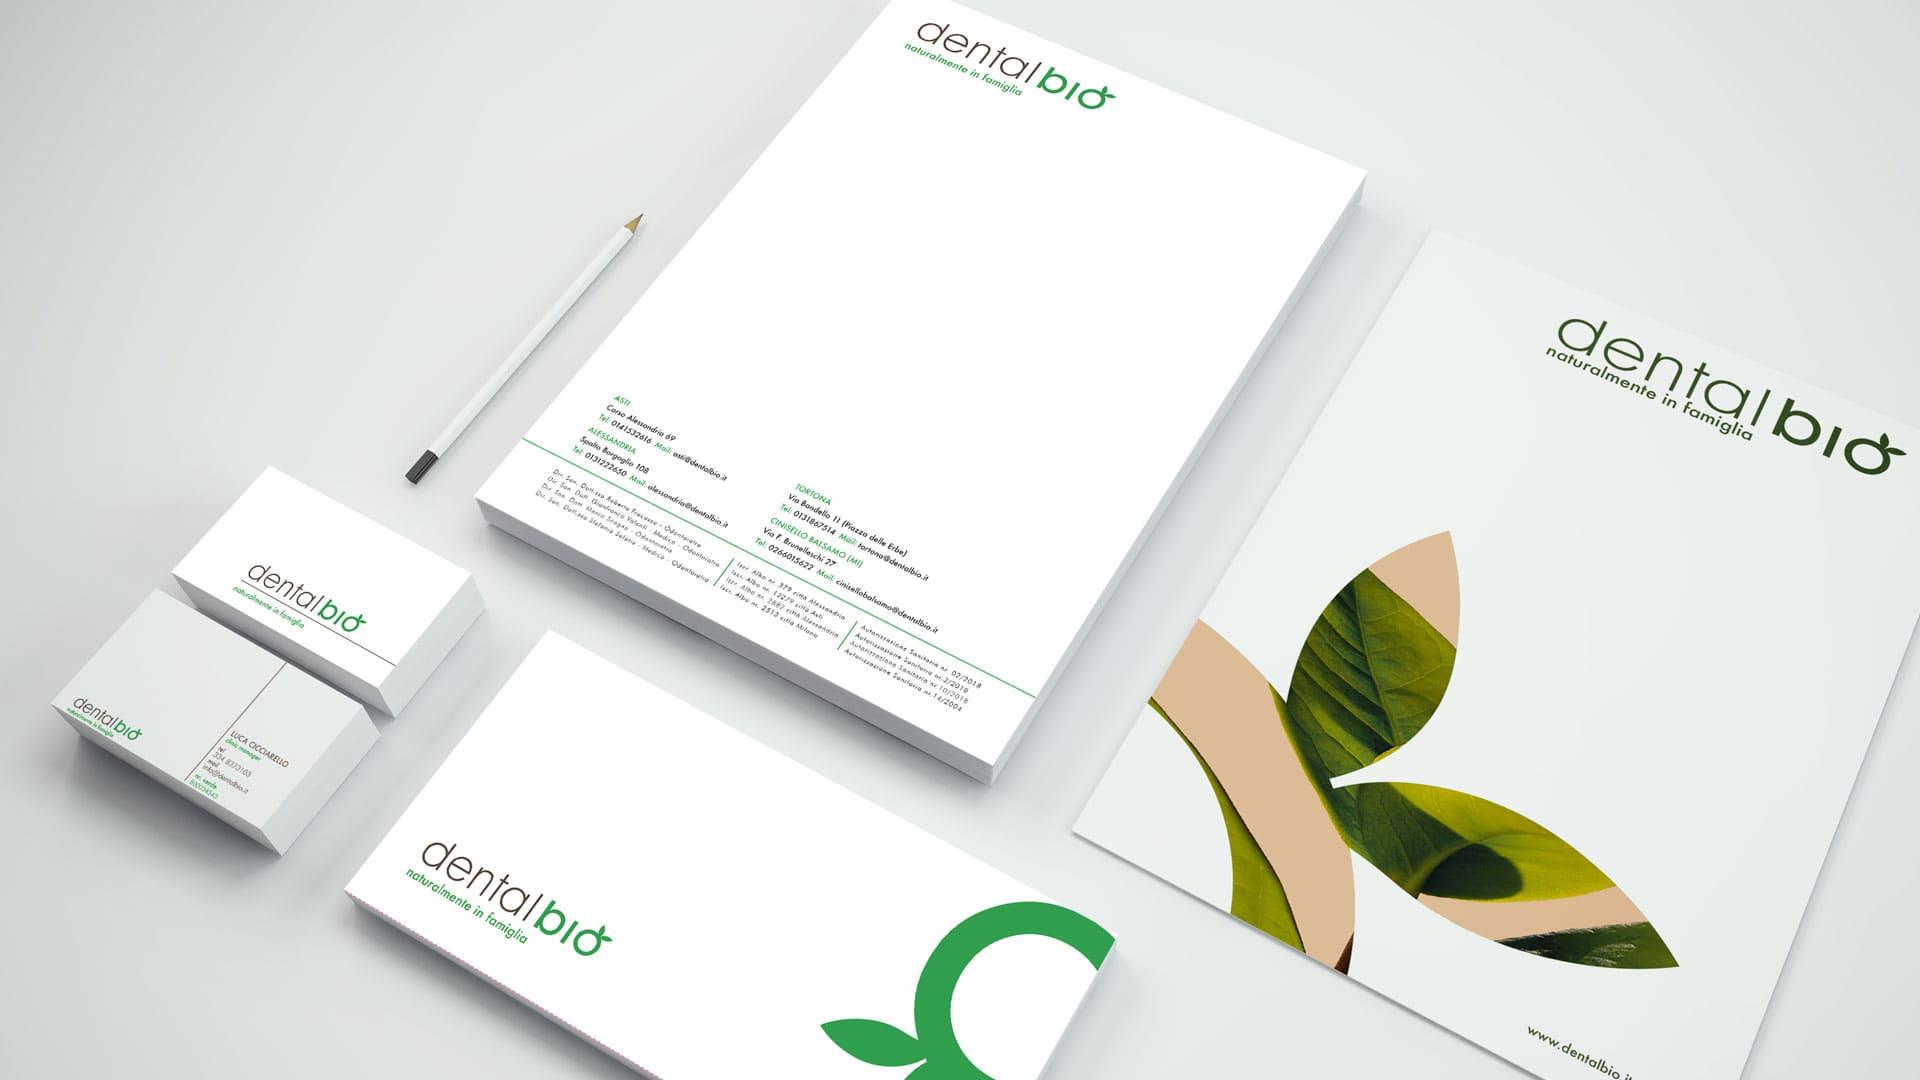 Dental-Bion_Linea-Coordinata